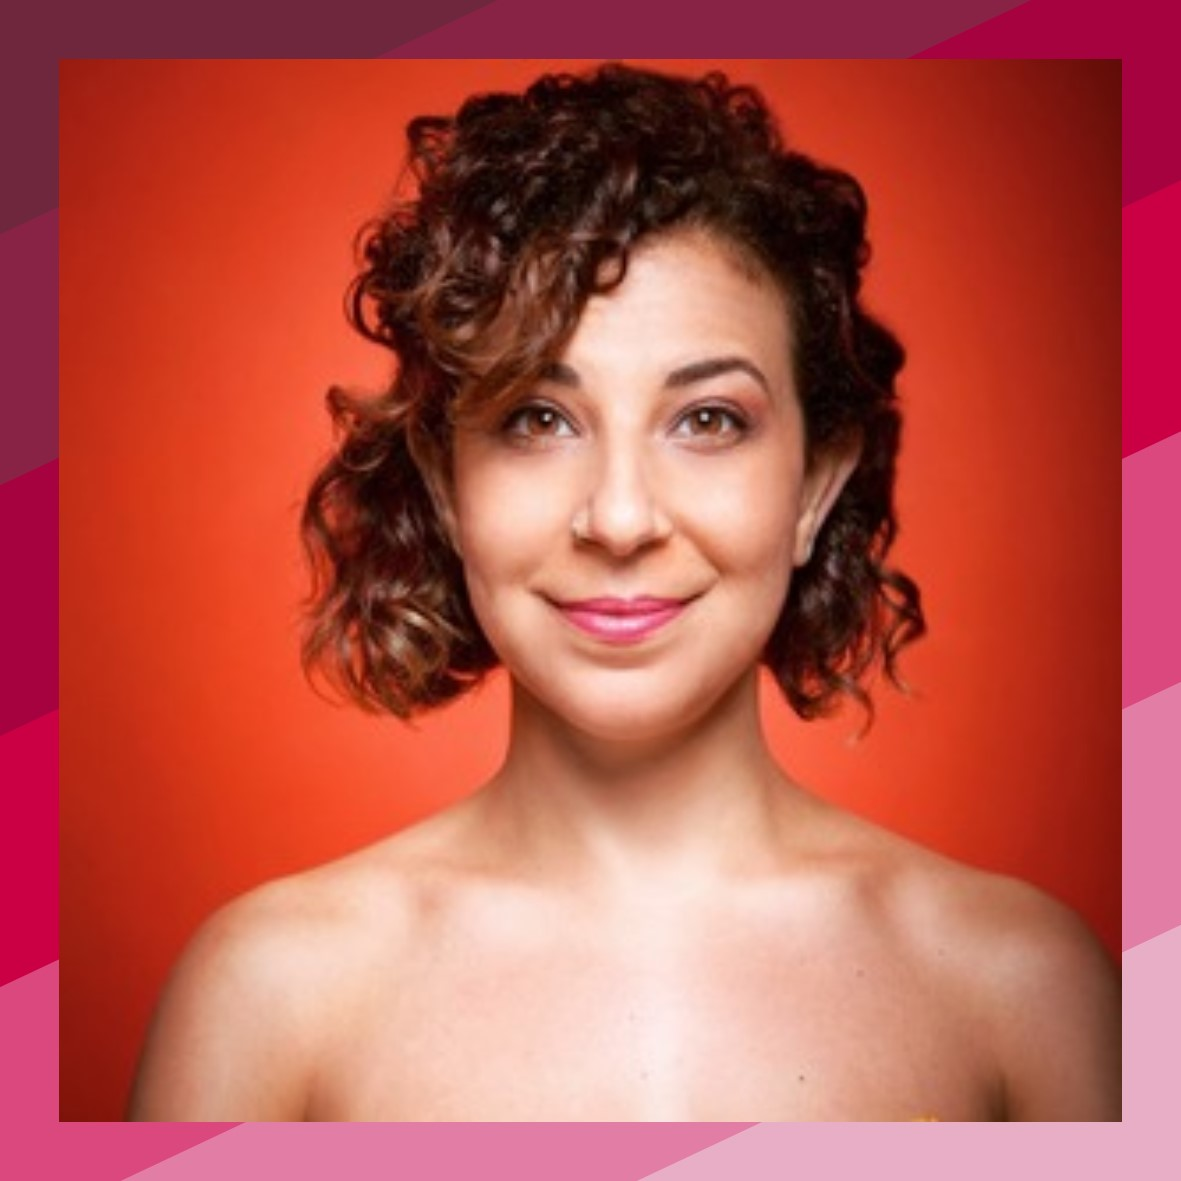 Maria Shehata Web Pic.jpg